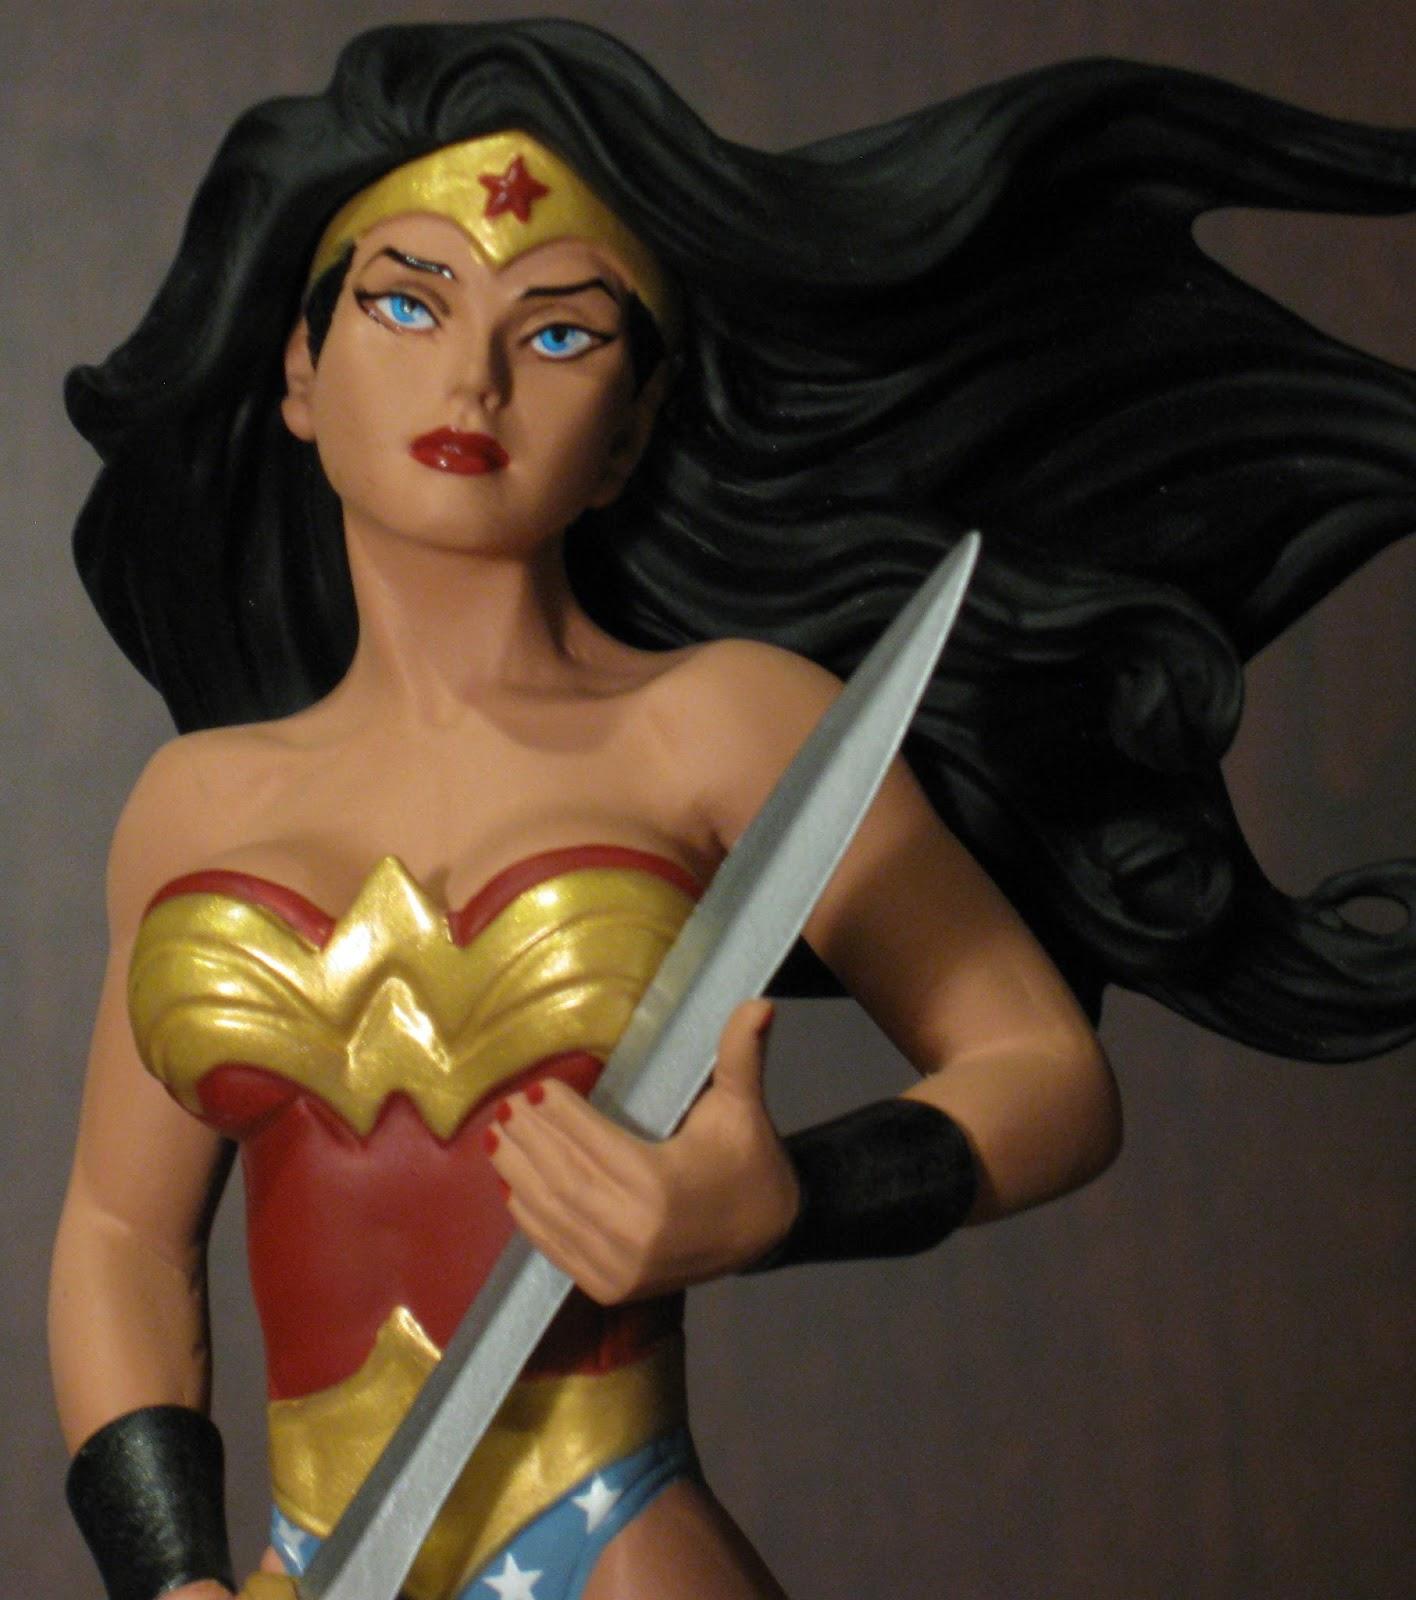 The Toyseum Wonder Woman Adam Hughes Art Of War Statue